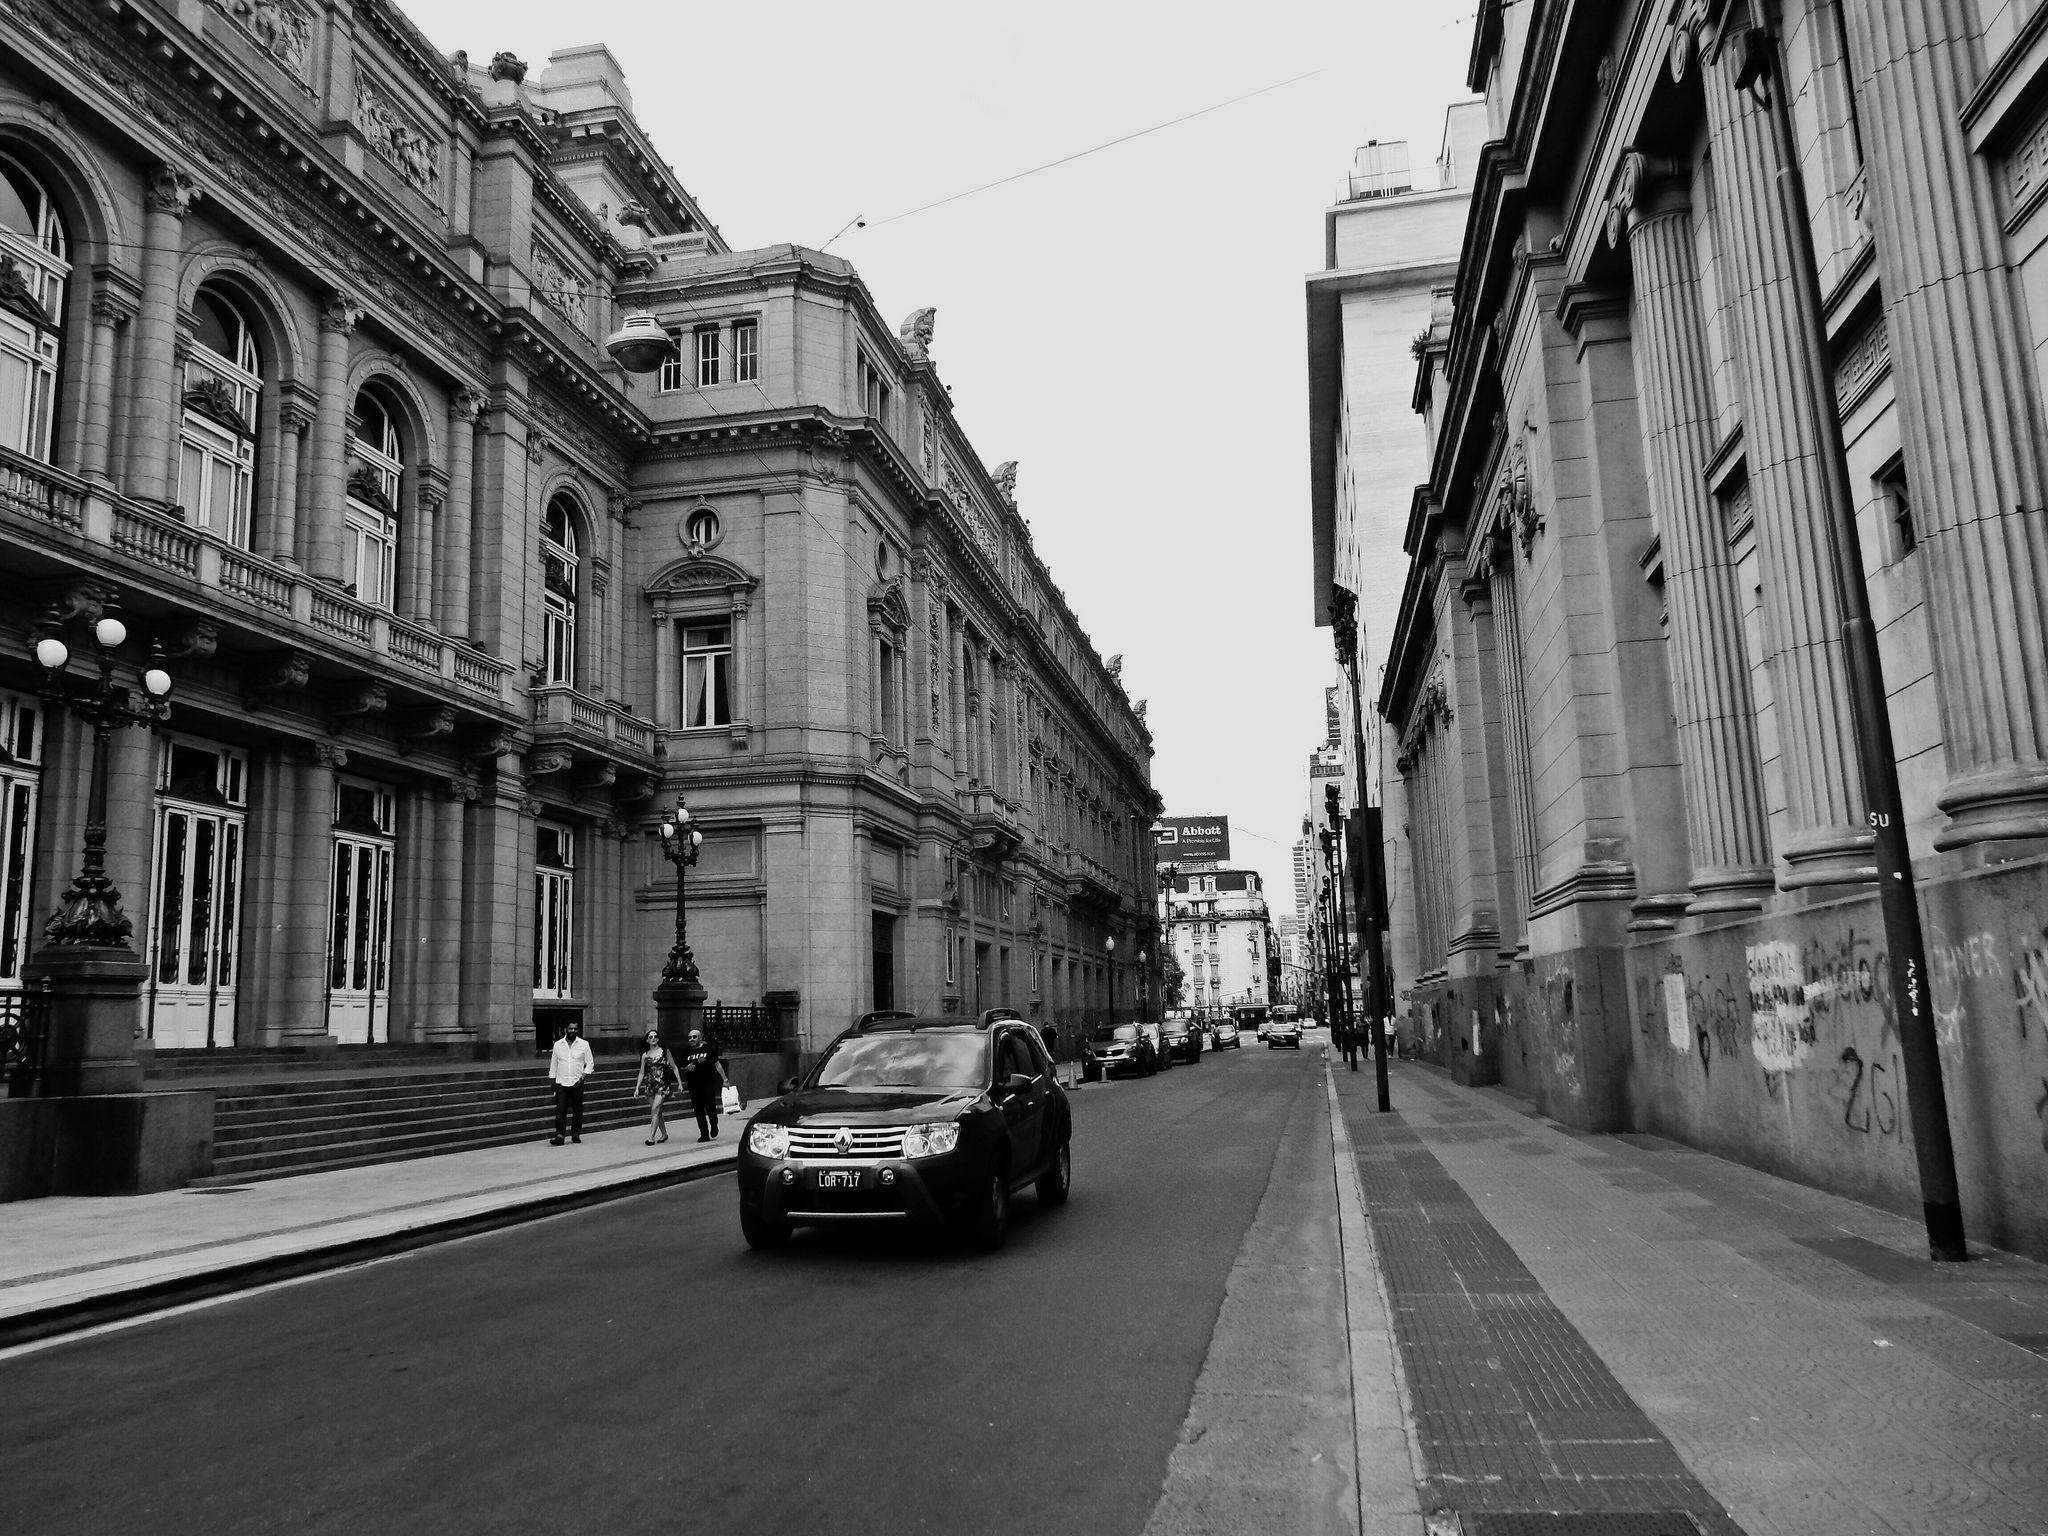 https://flic.kr/s/aHskGoWyzE | Calle Tucumán between Libertad & Cerrito, Buenos Aires | Calle Tucumán between Libertad & Cerrito, Buenos Aires